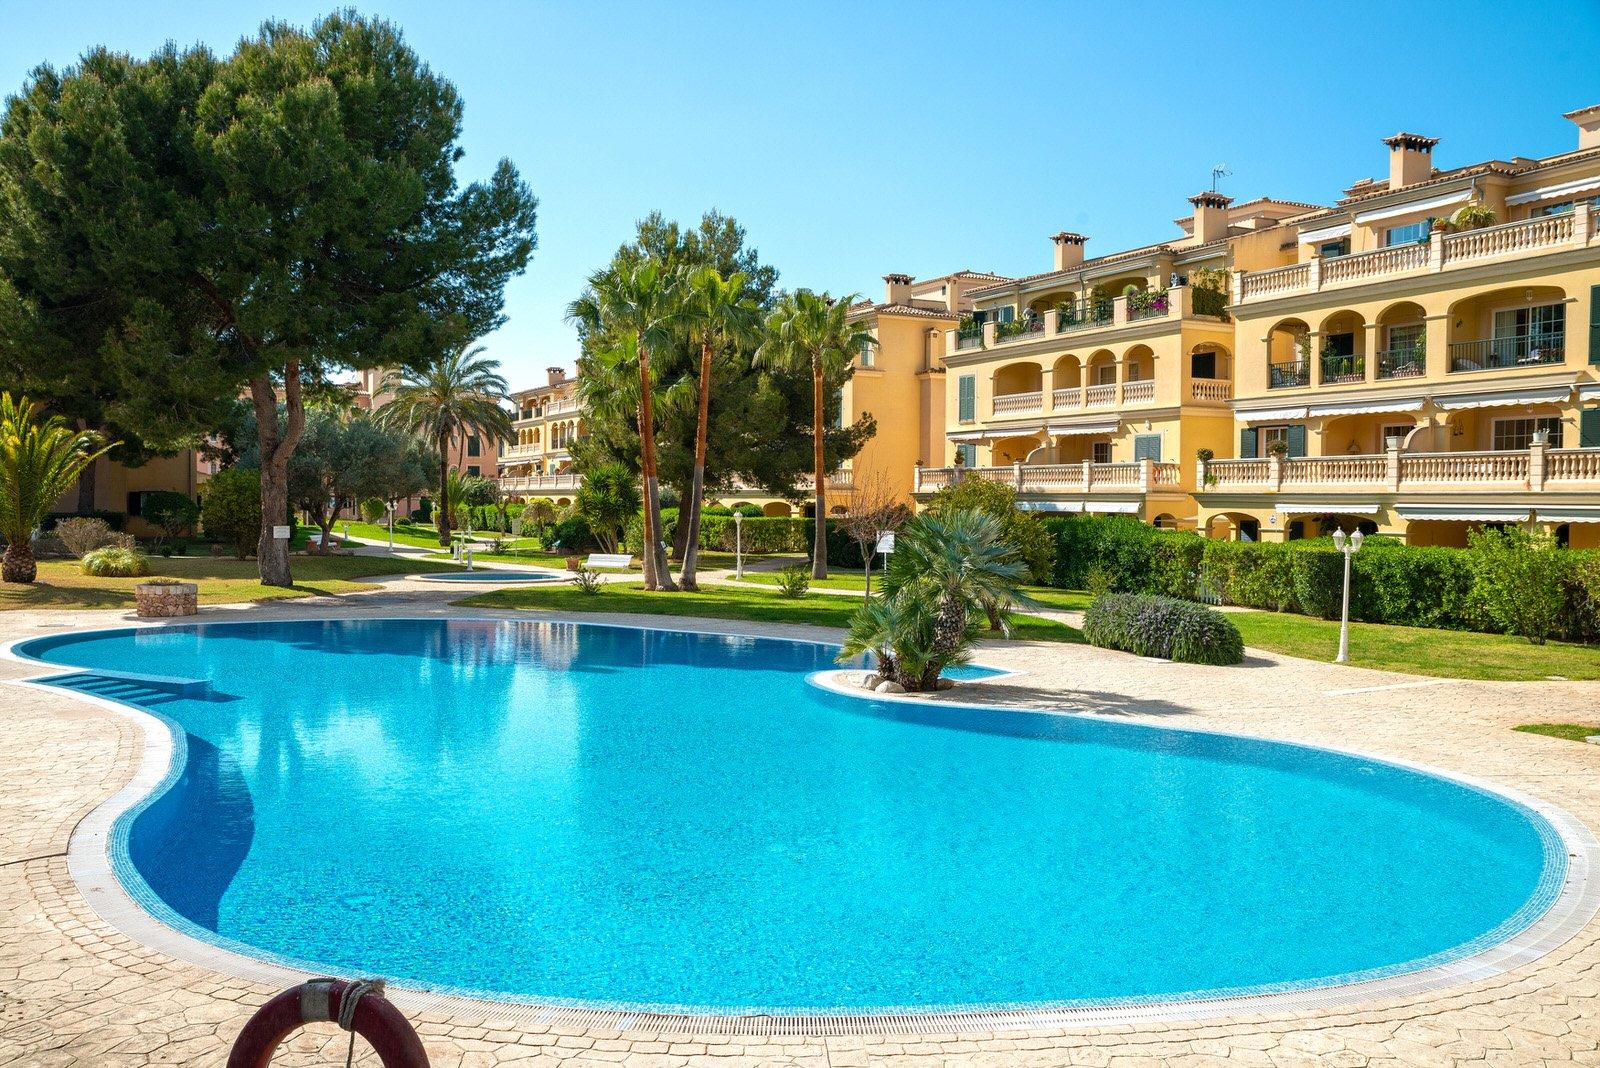 Puig de Ros Apartment mit Garten in gepfleter Anlage mit Pool u. Padelplatz